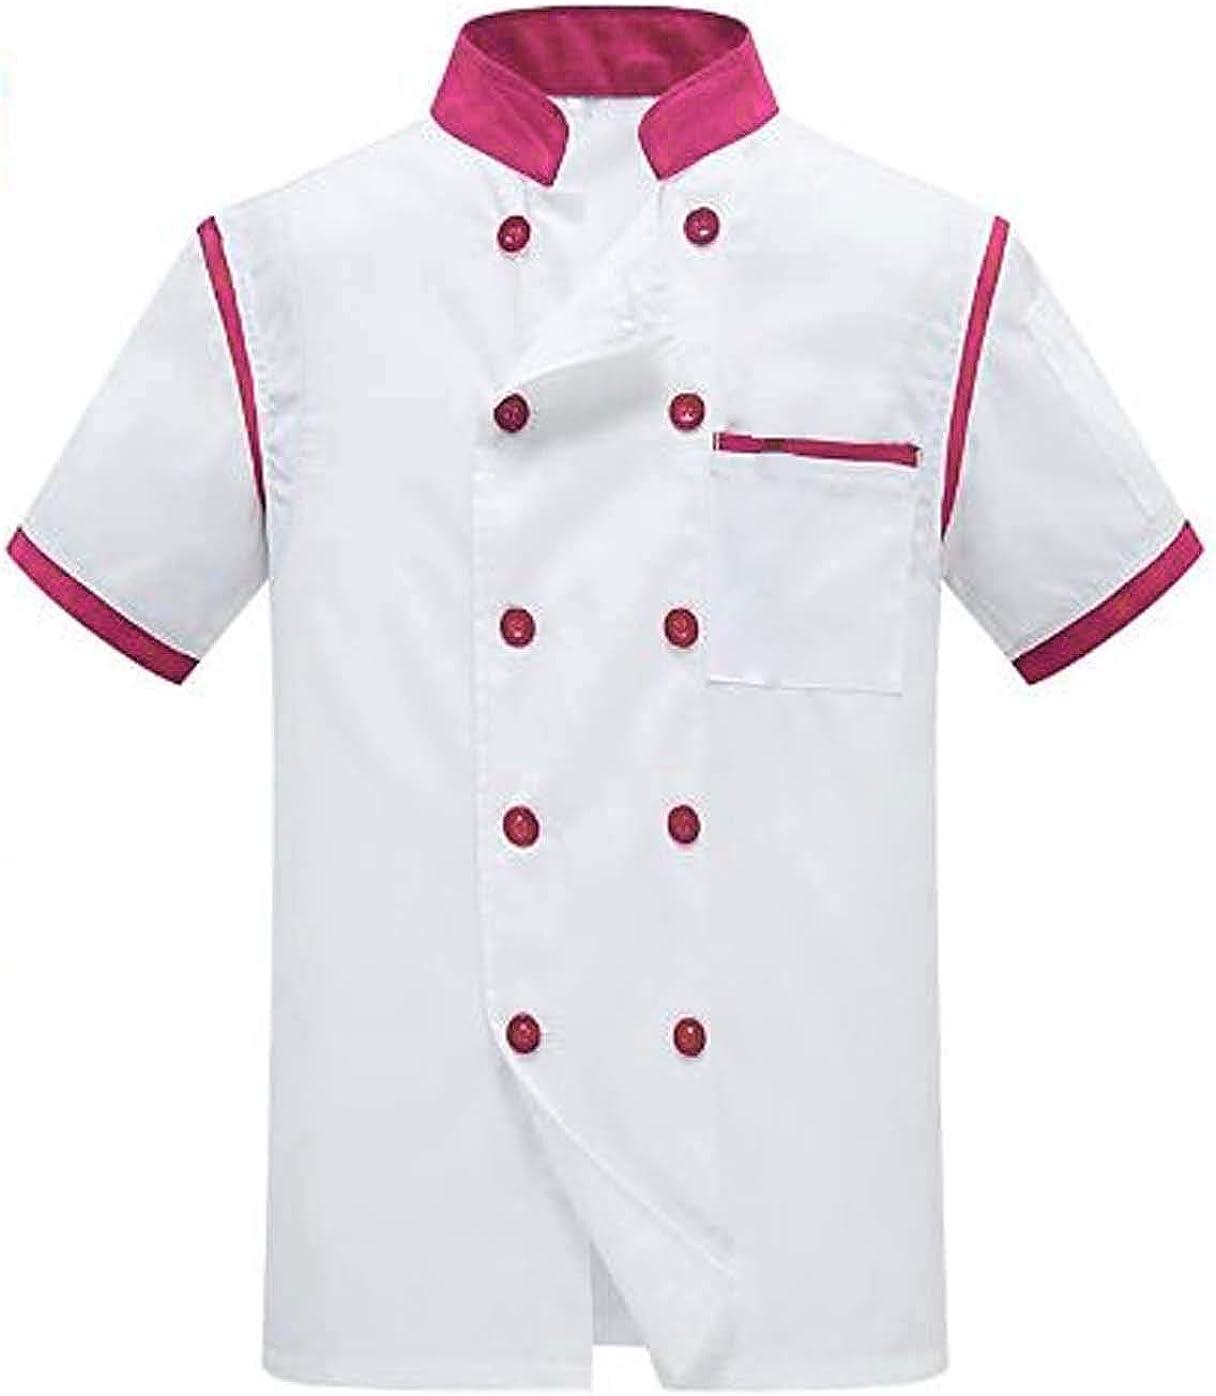 Popular products Primebail WH1 Under blast sales Coat Light Weight Half Jacket W Chef Men